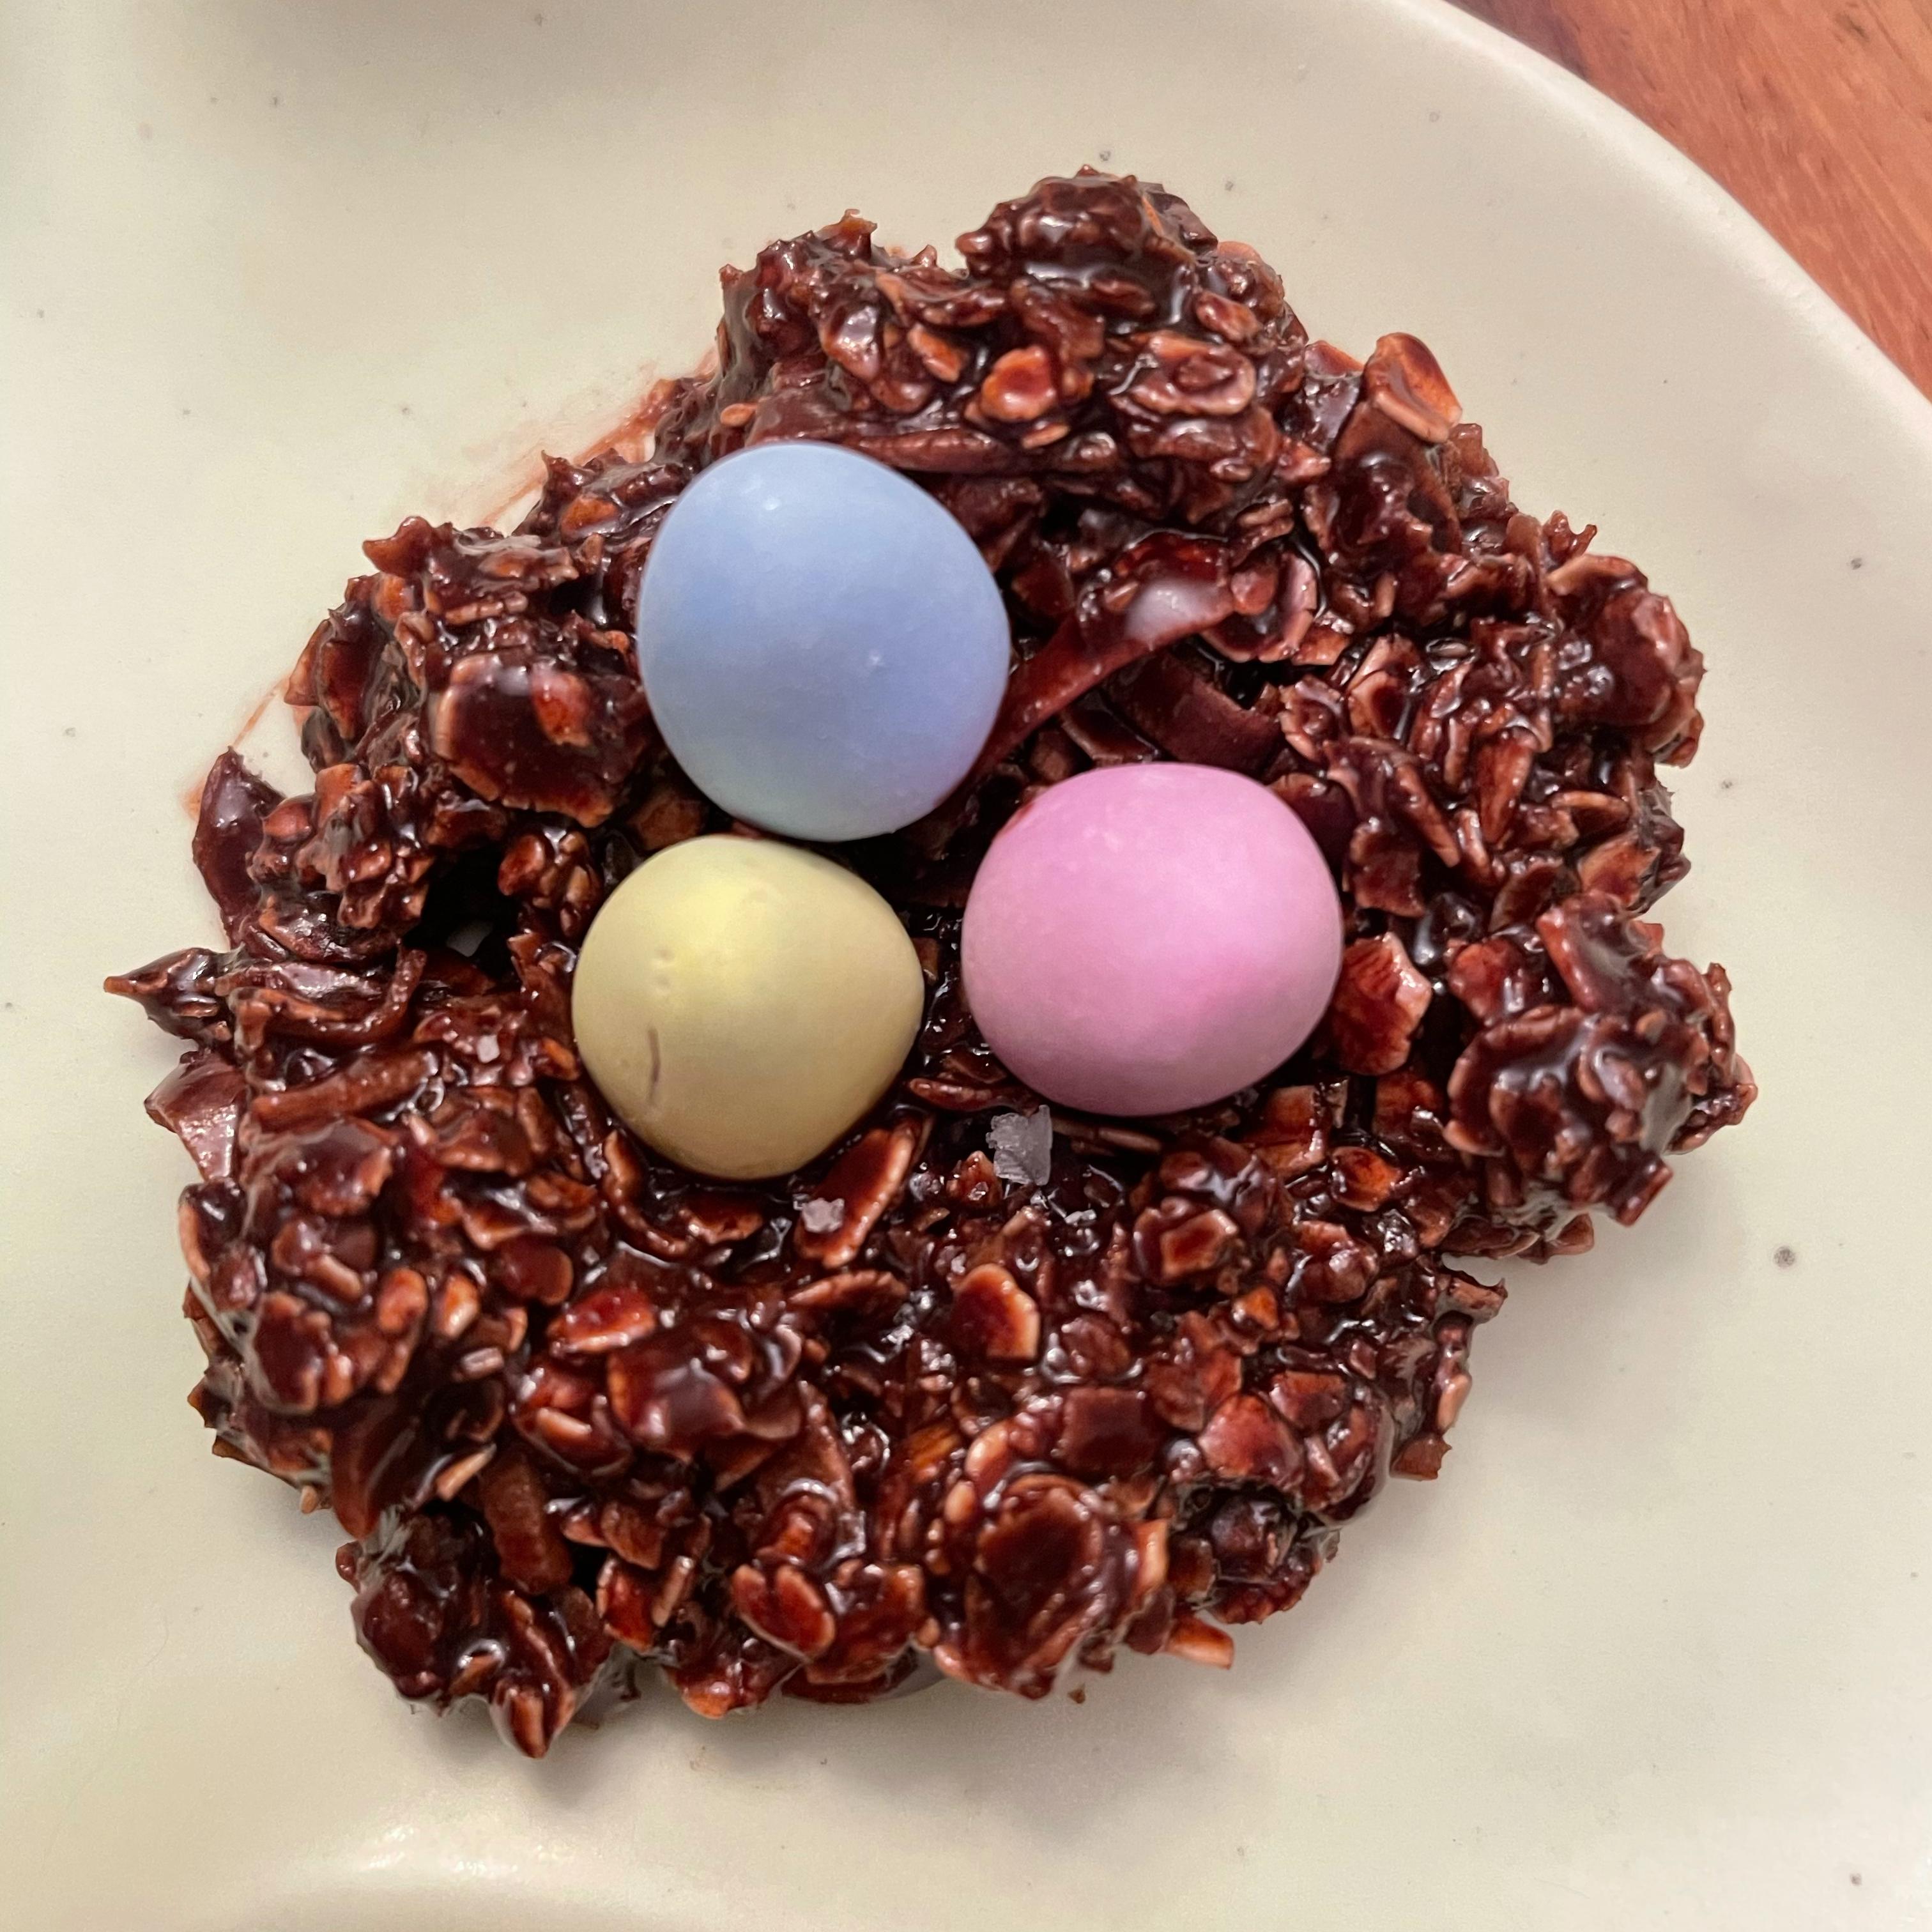 Peanut-Free Chocolate Macaroons PomPom99